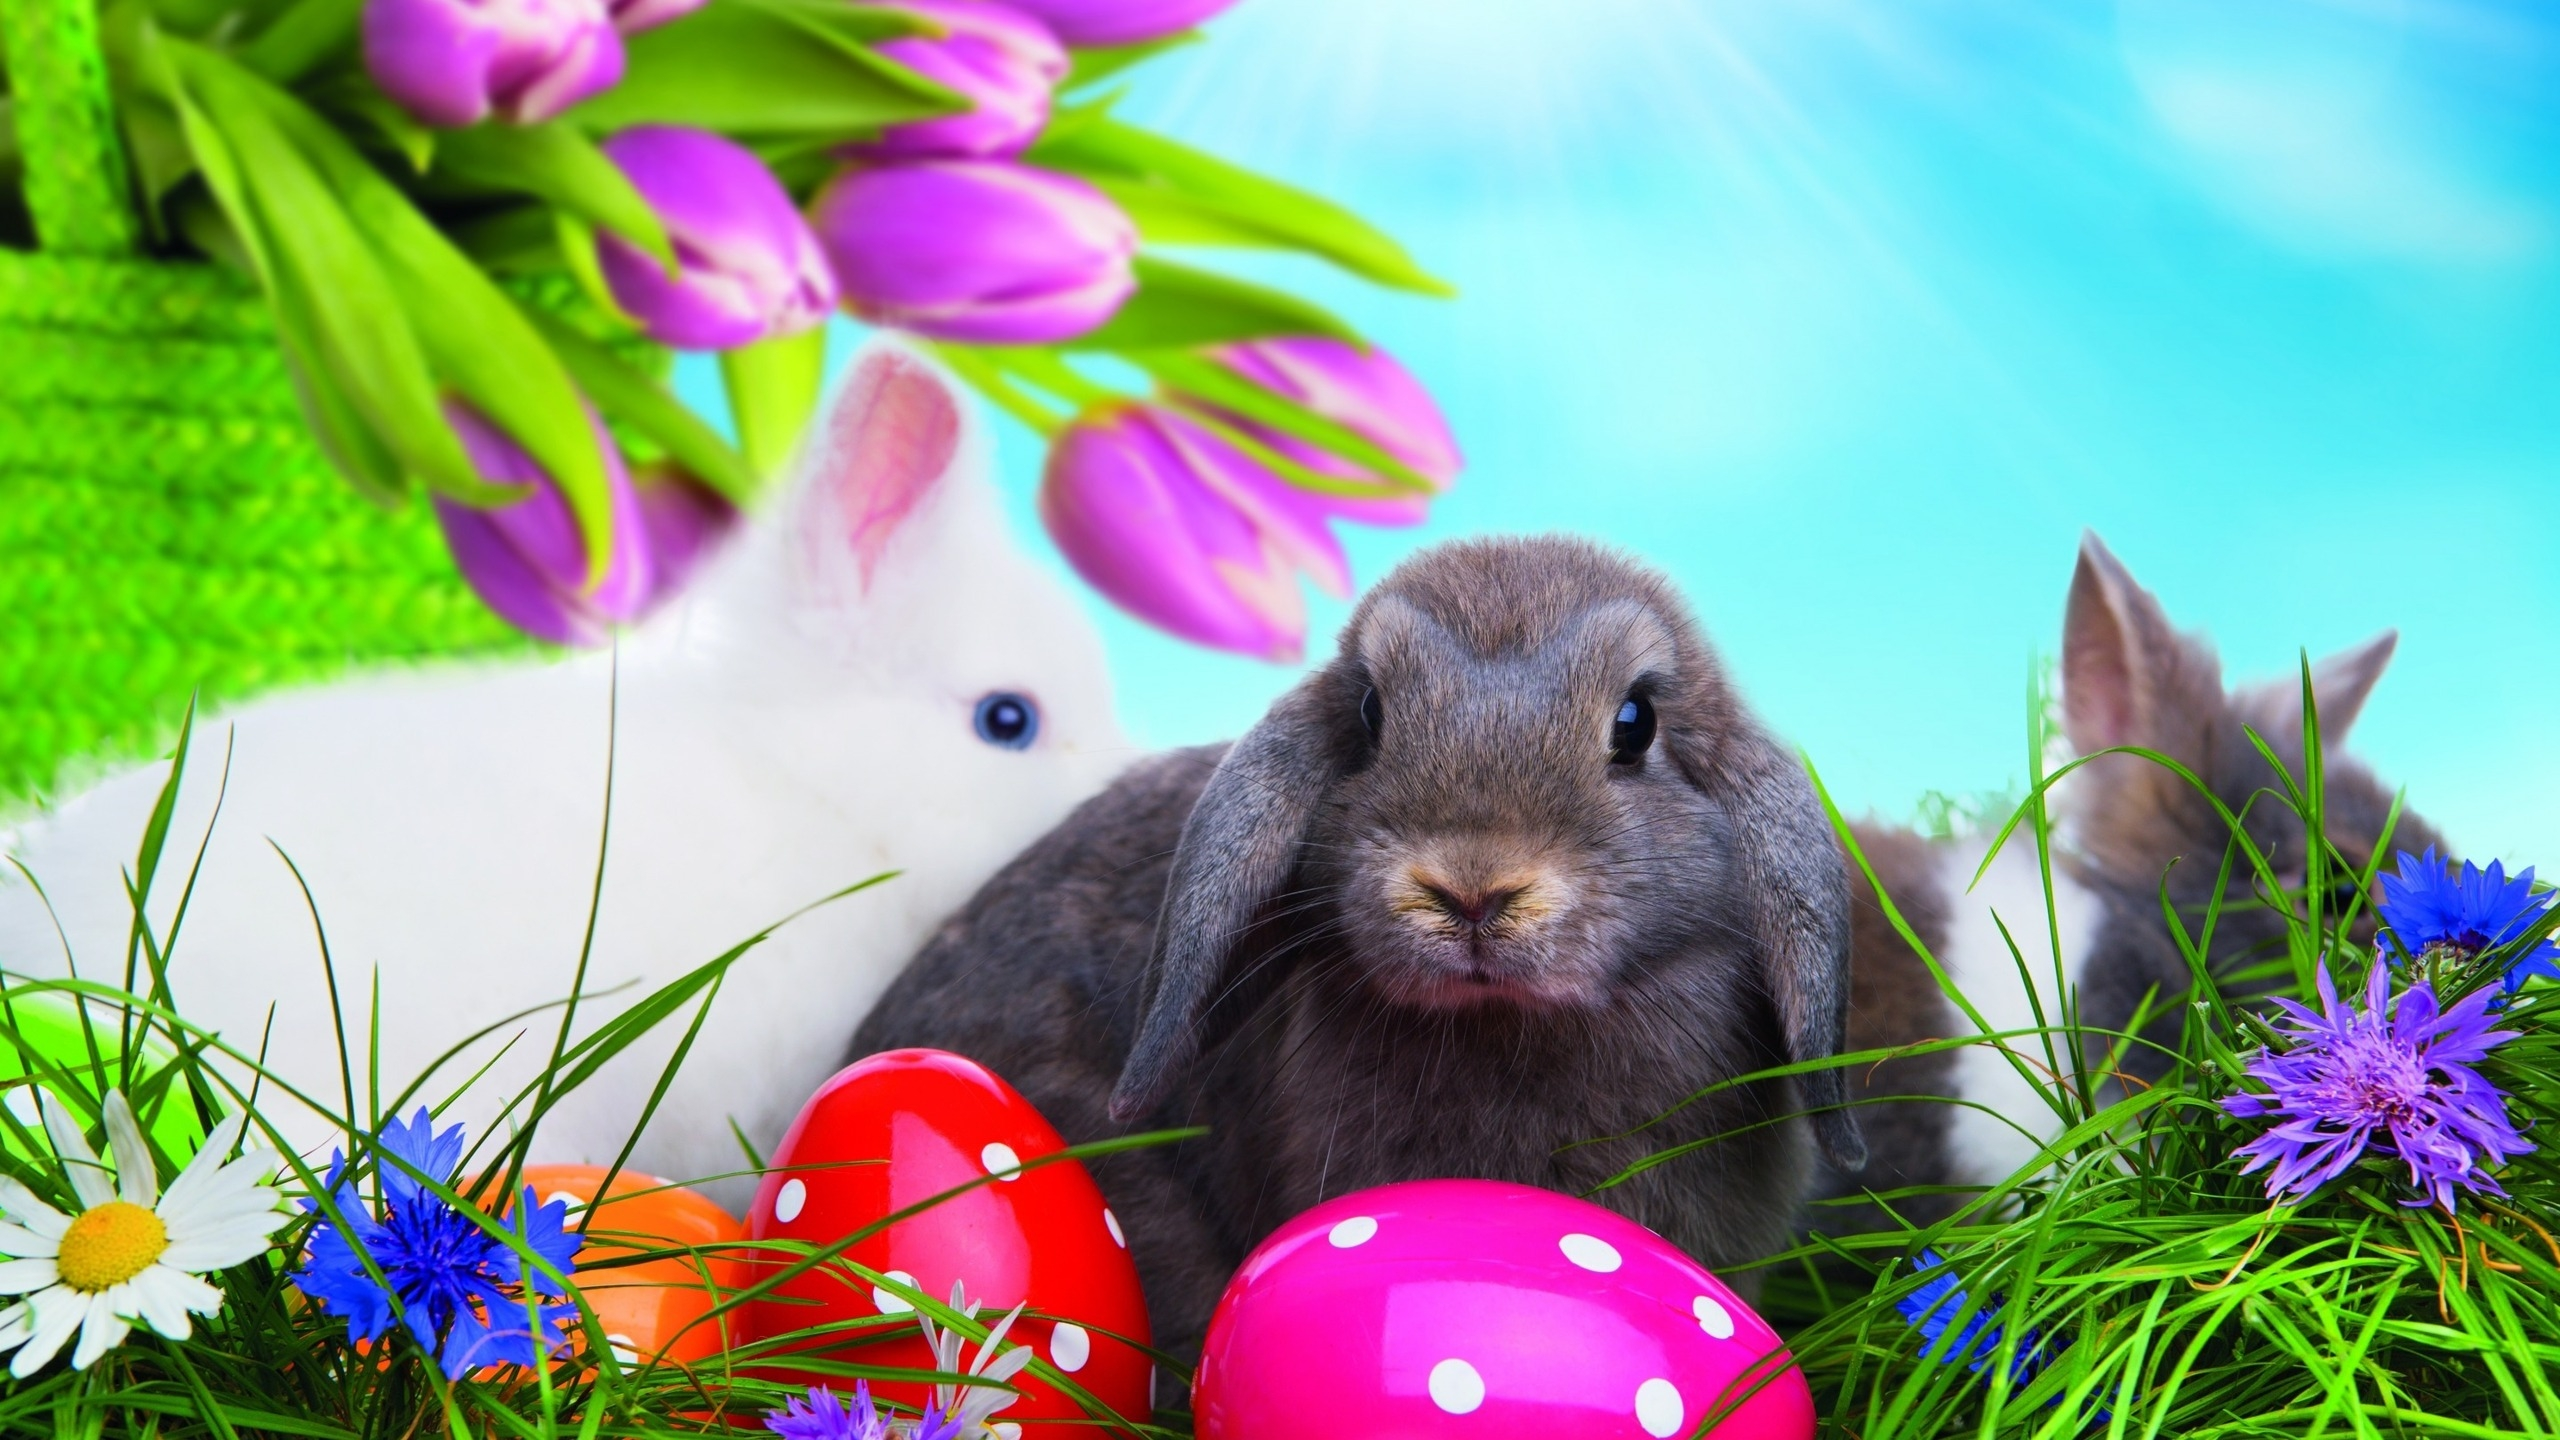 Easter Bunny HD Wallpaper   WallpaperFX 2560x1440